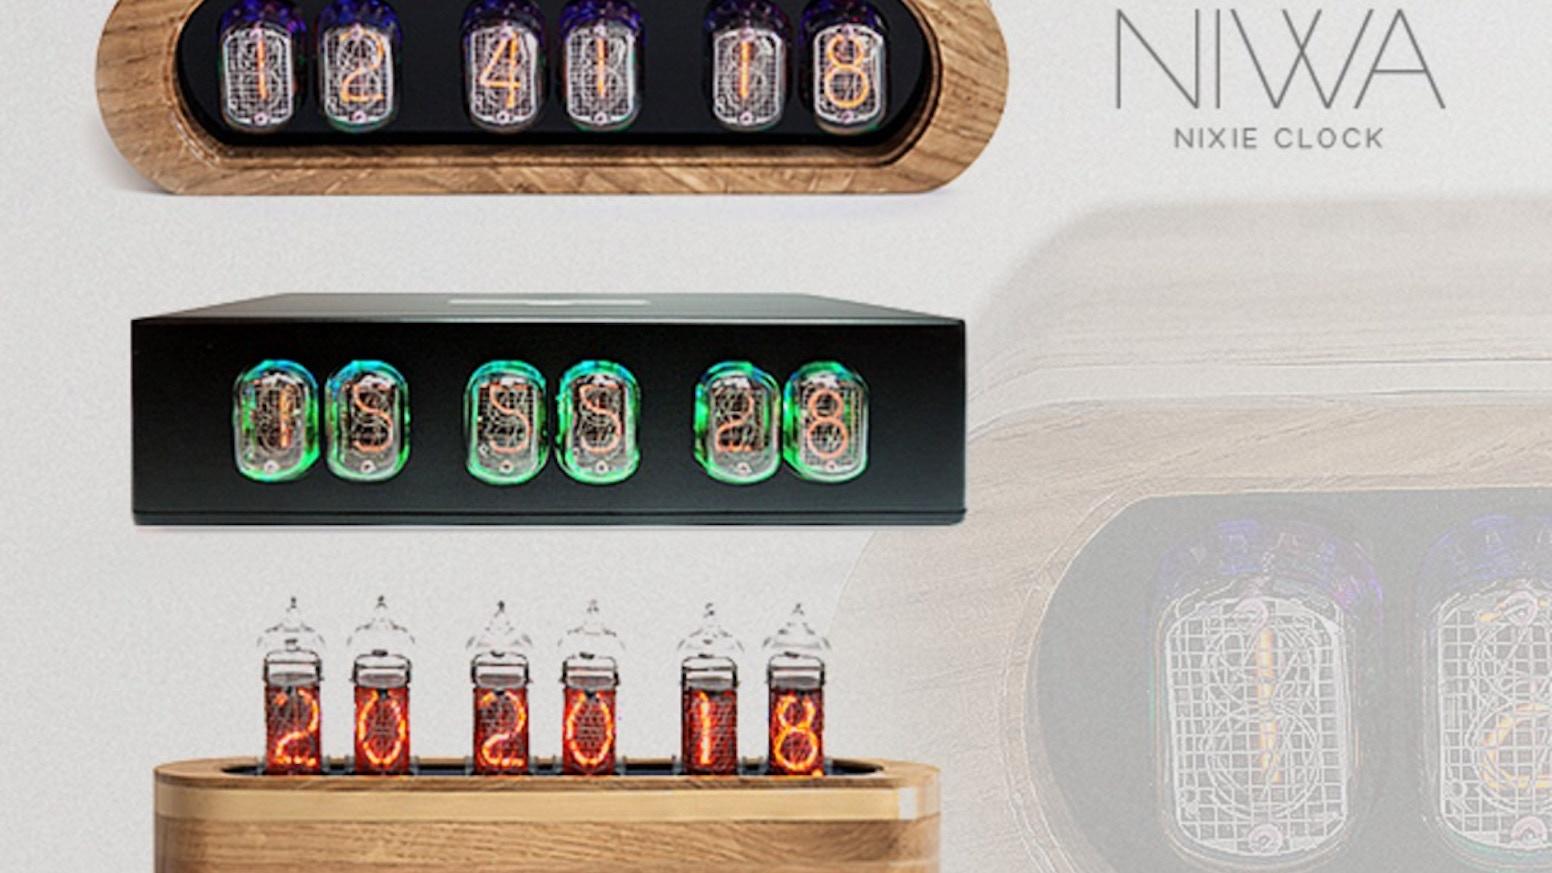 niwa modern trends and classic shine of nixie clock 2 0 by yauheni